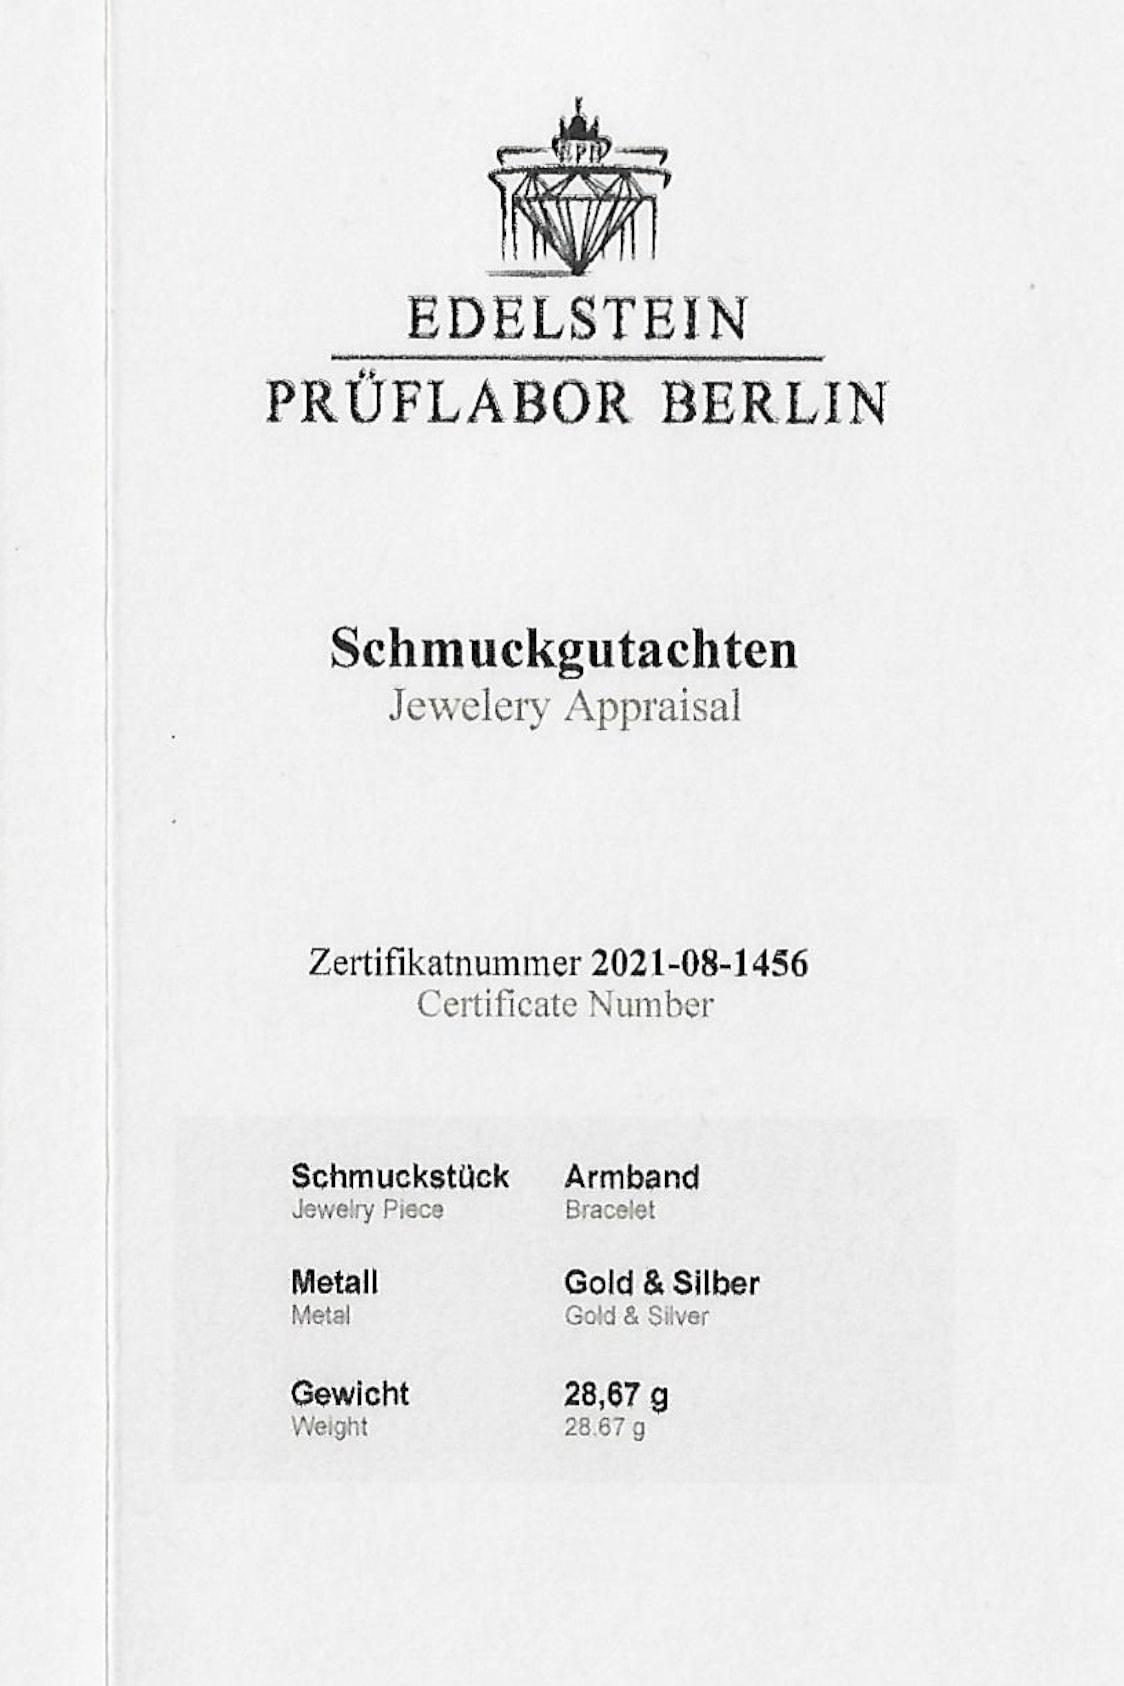 1016-Zertifikat-2